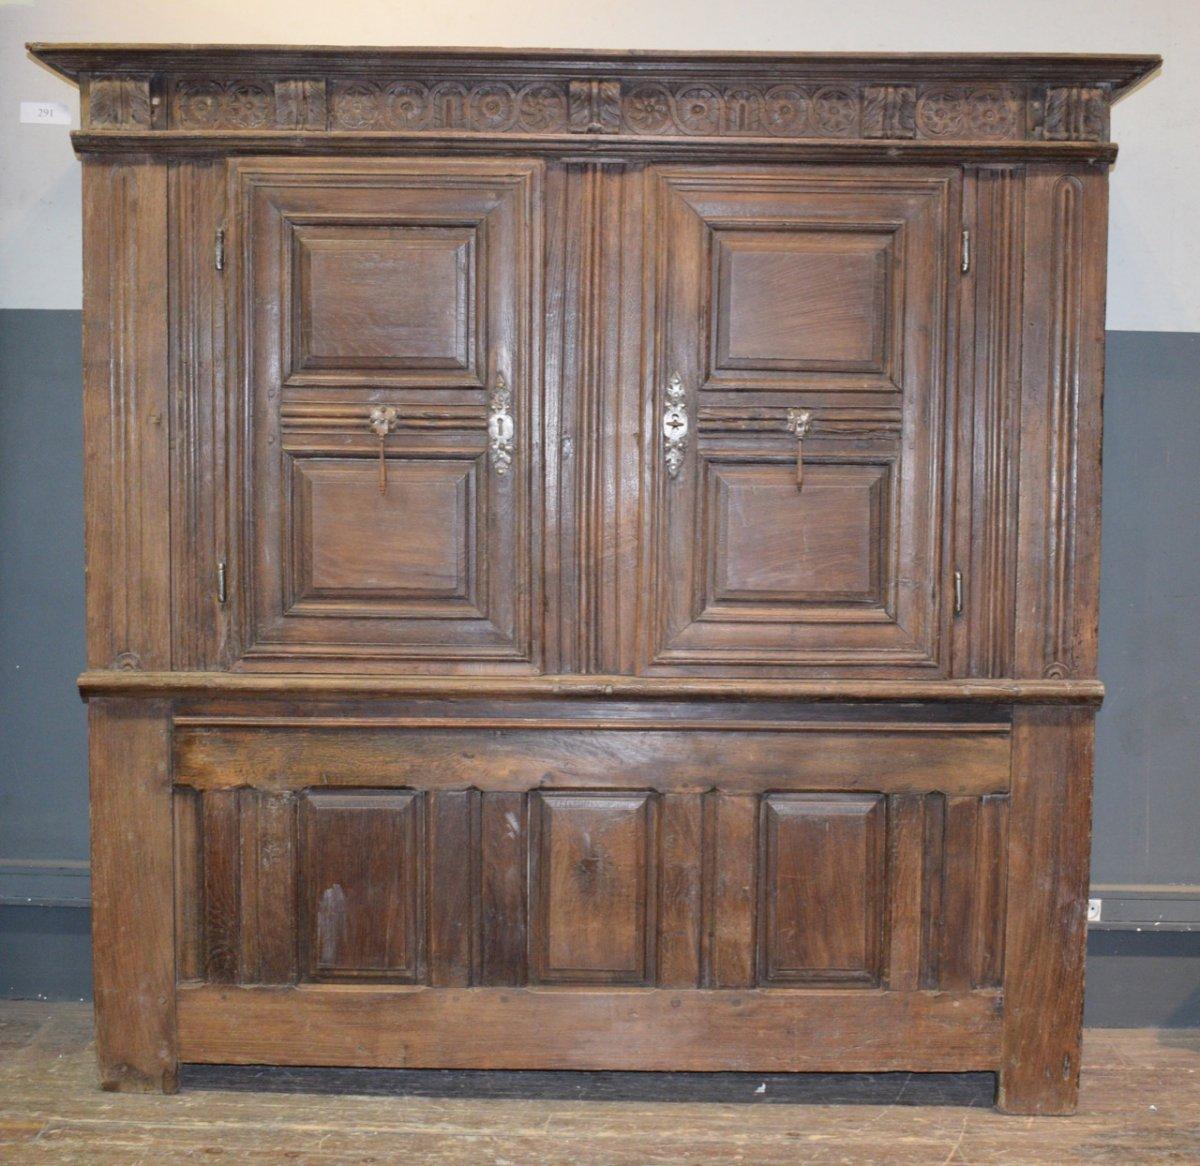 Sacristy Furniture In Chene XVI Eme Century